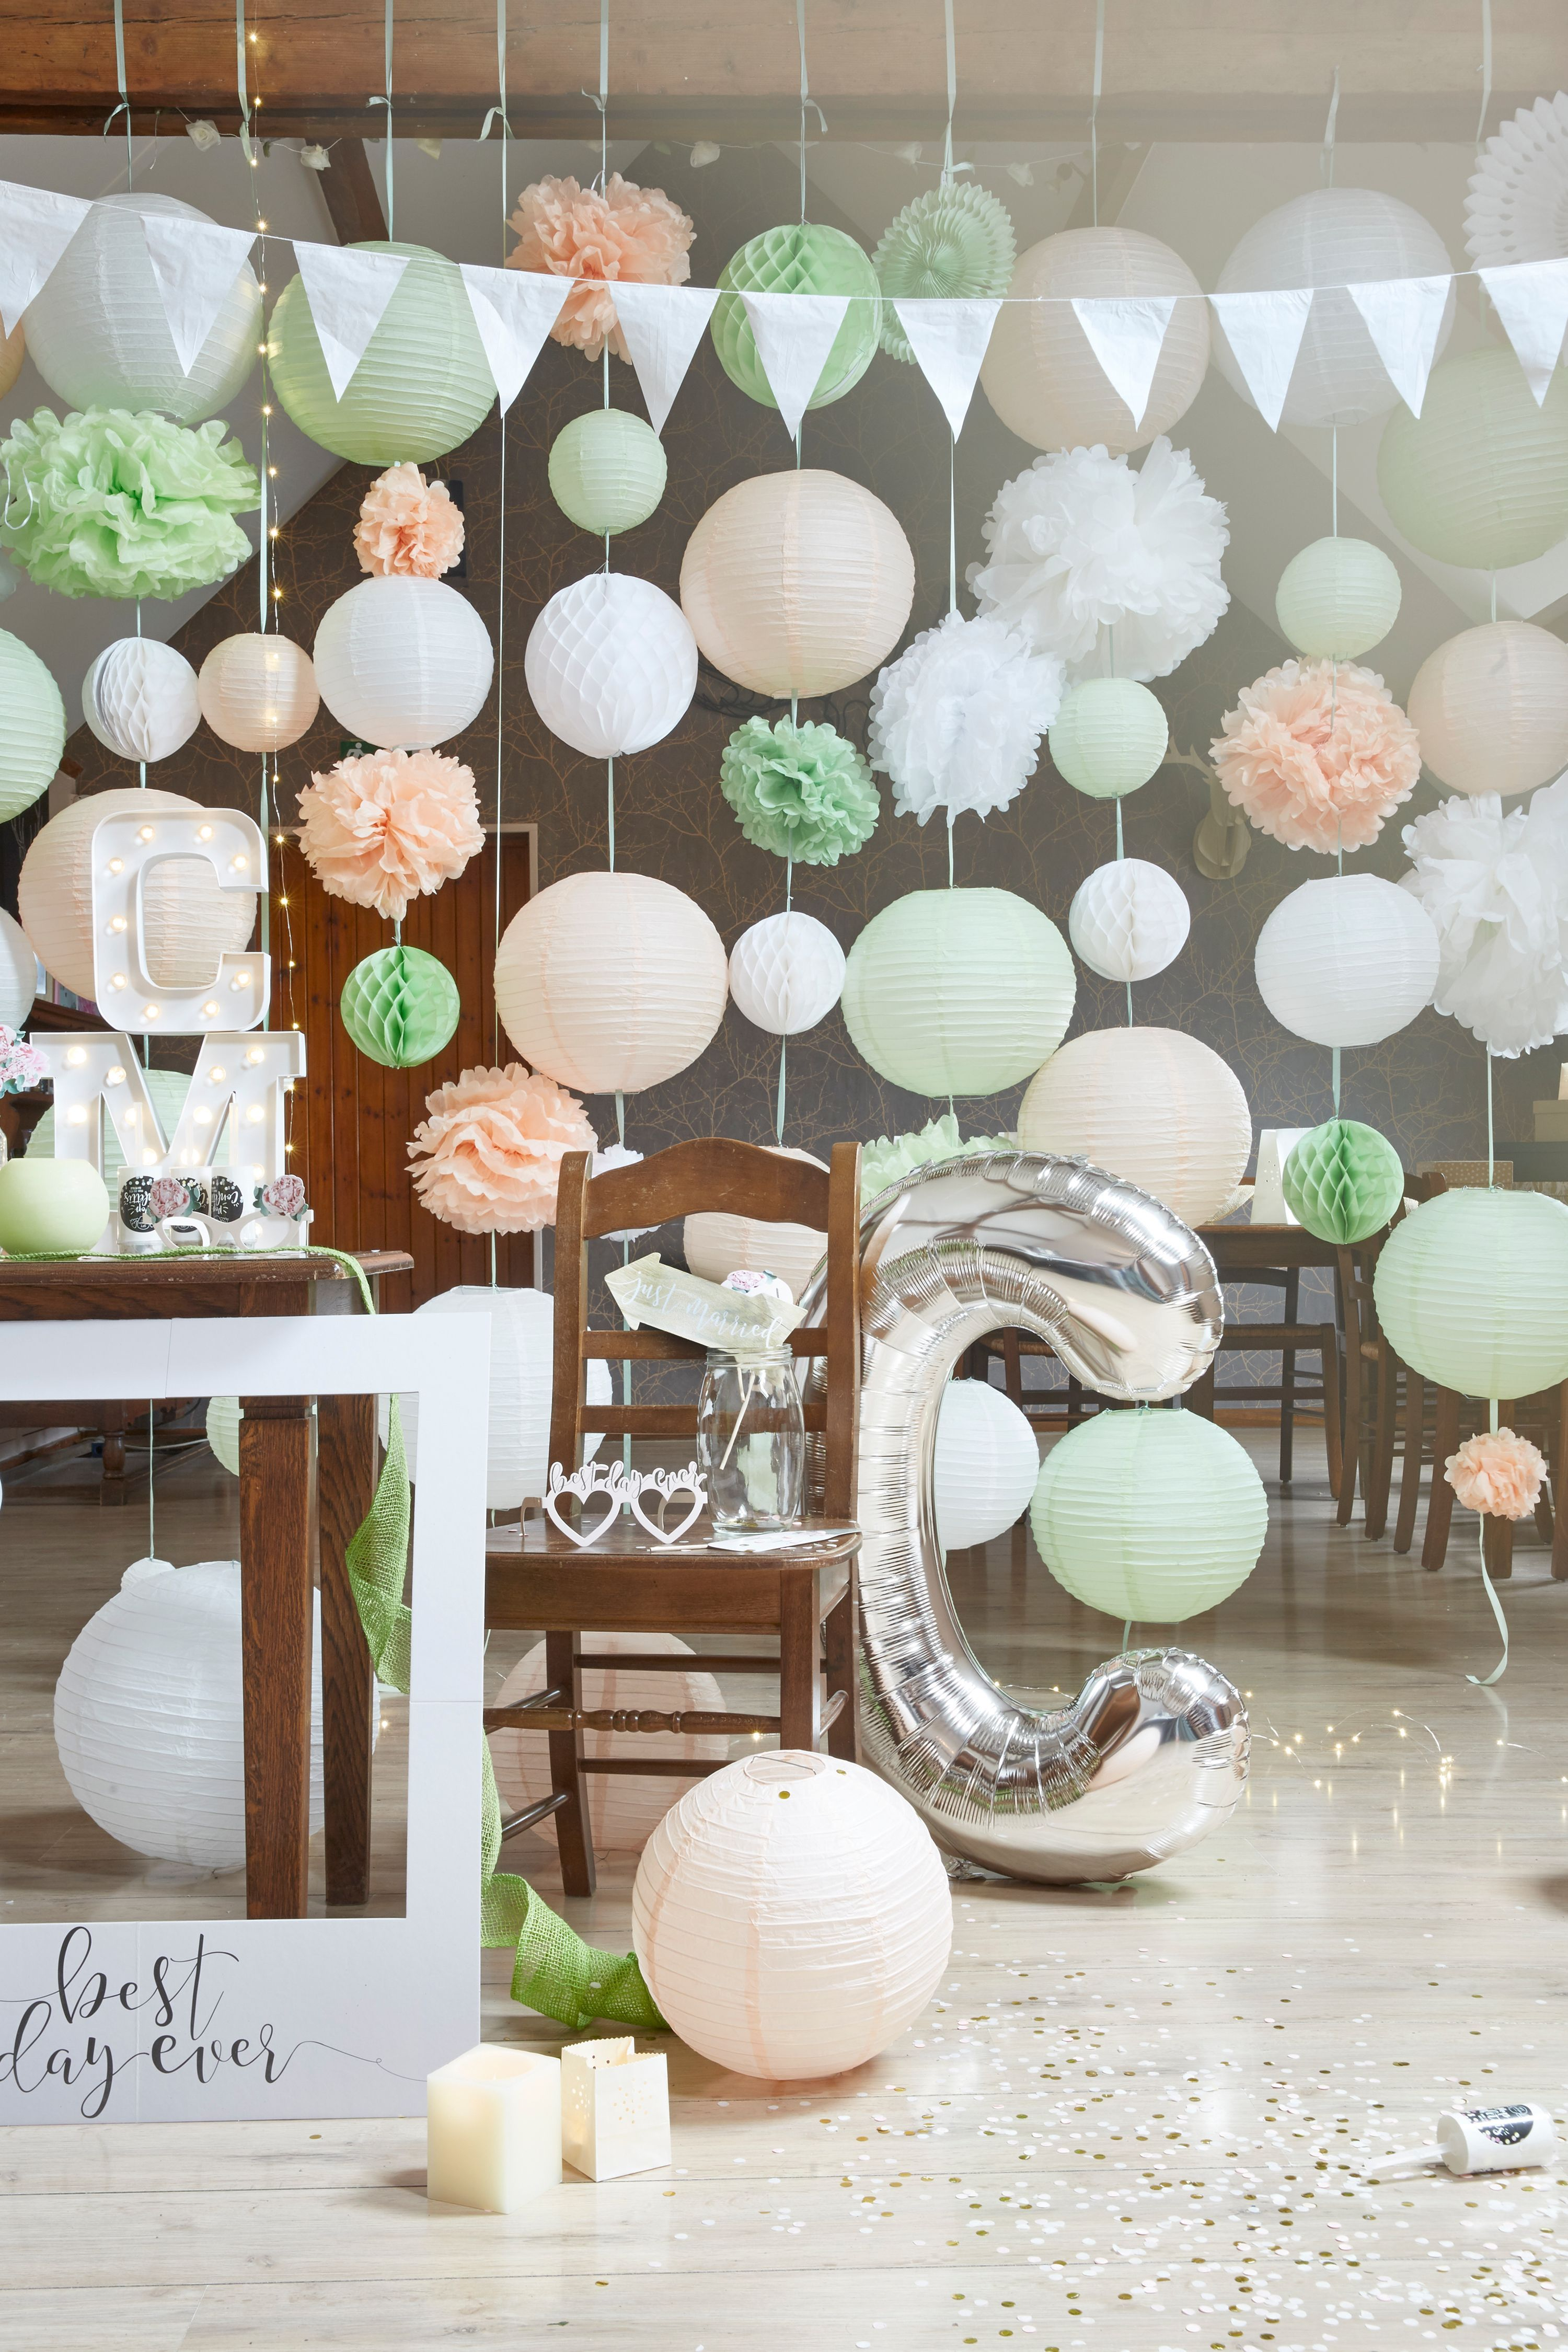 fond photocall mariage de r ve photobooth mariage au top. Black Bedroom Furniture Sets. Home Design Ideas